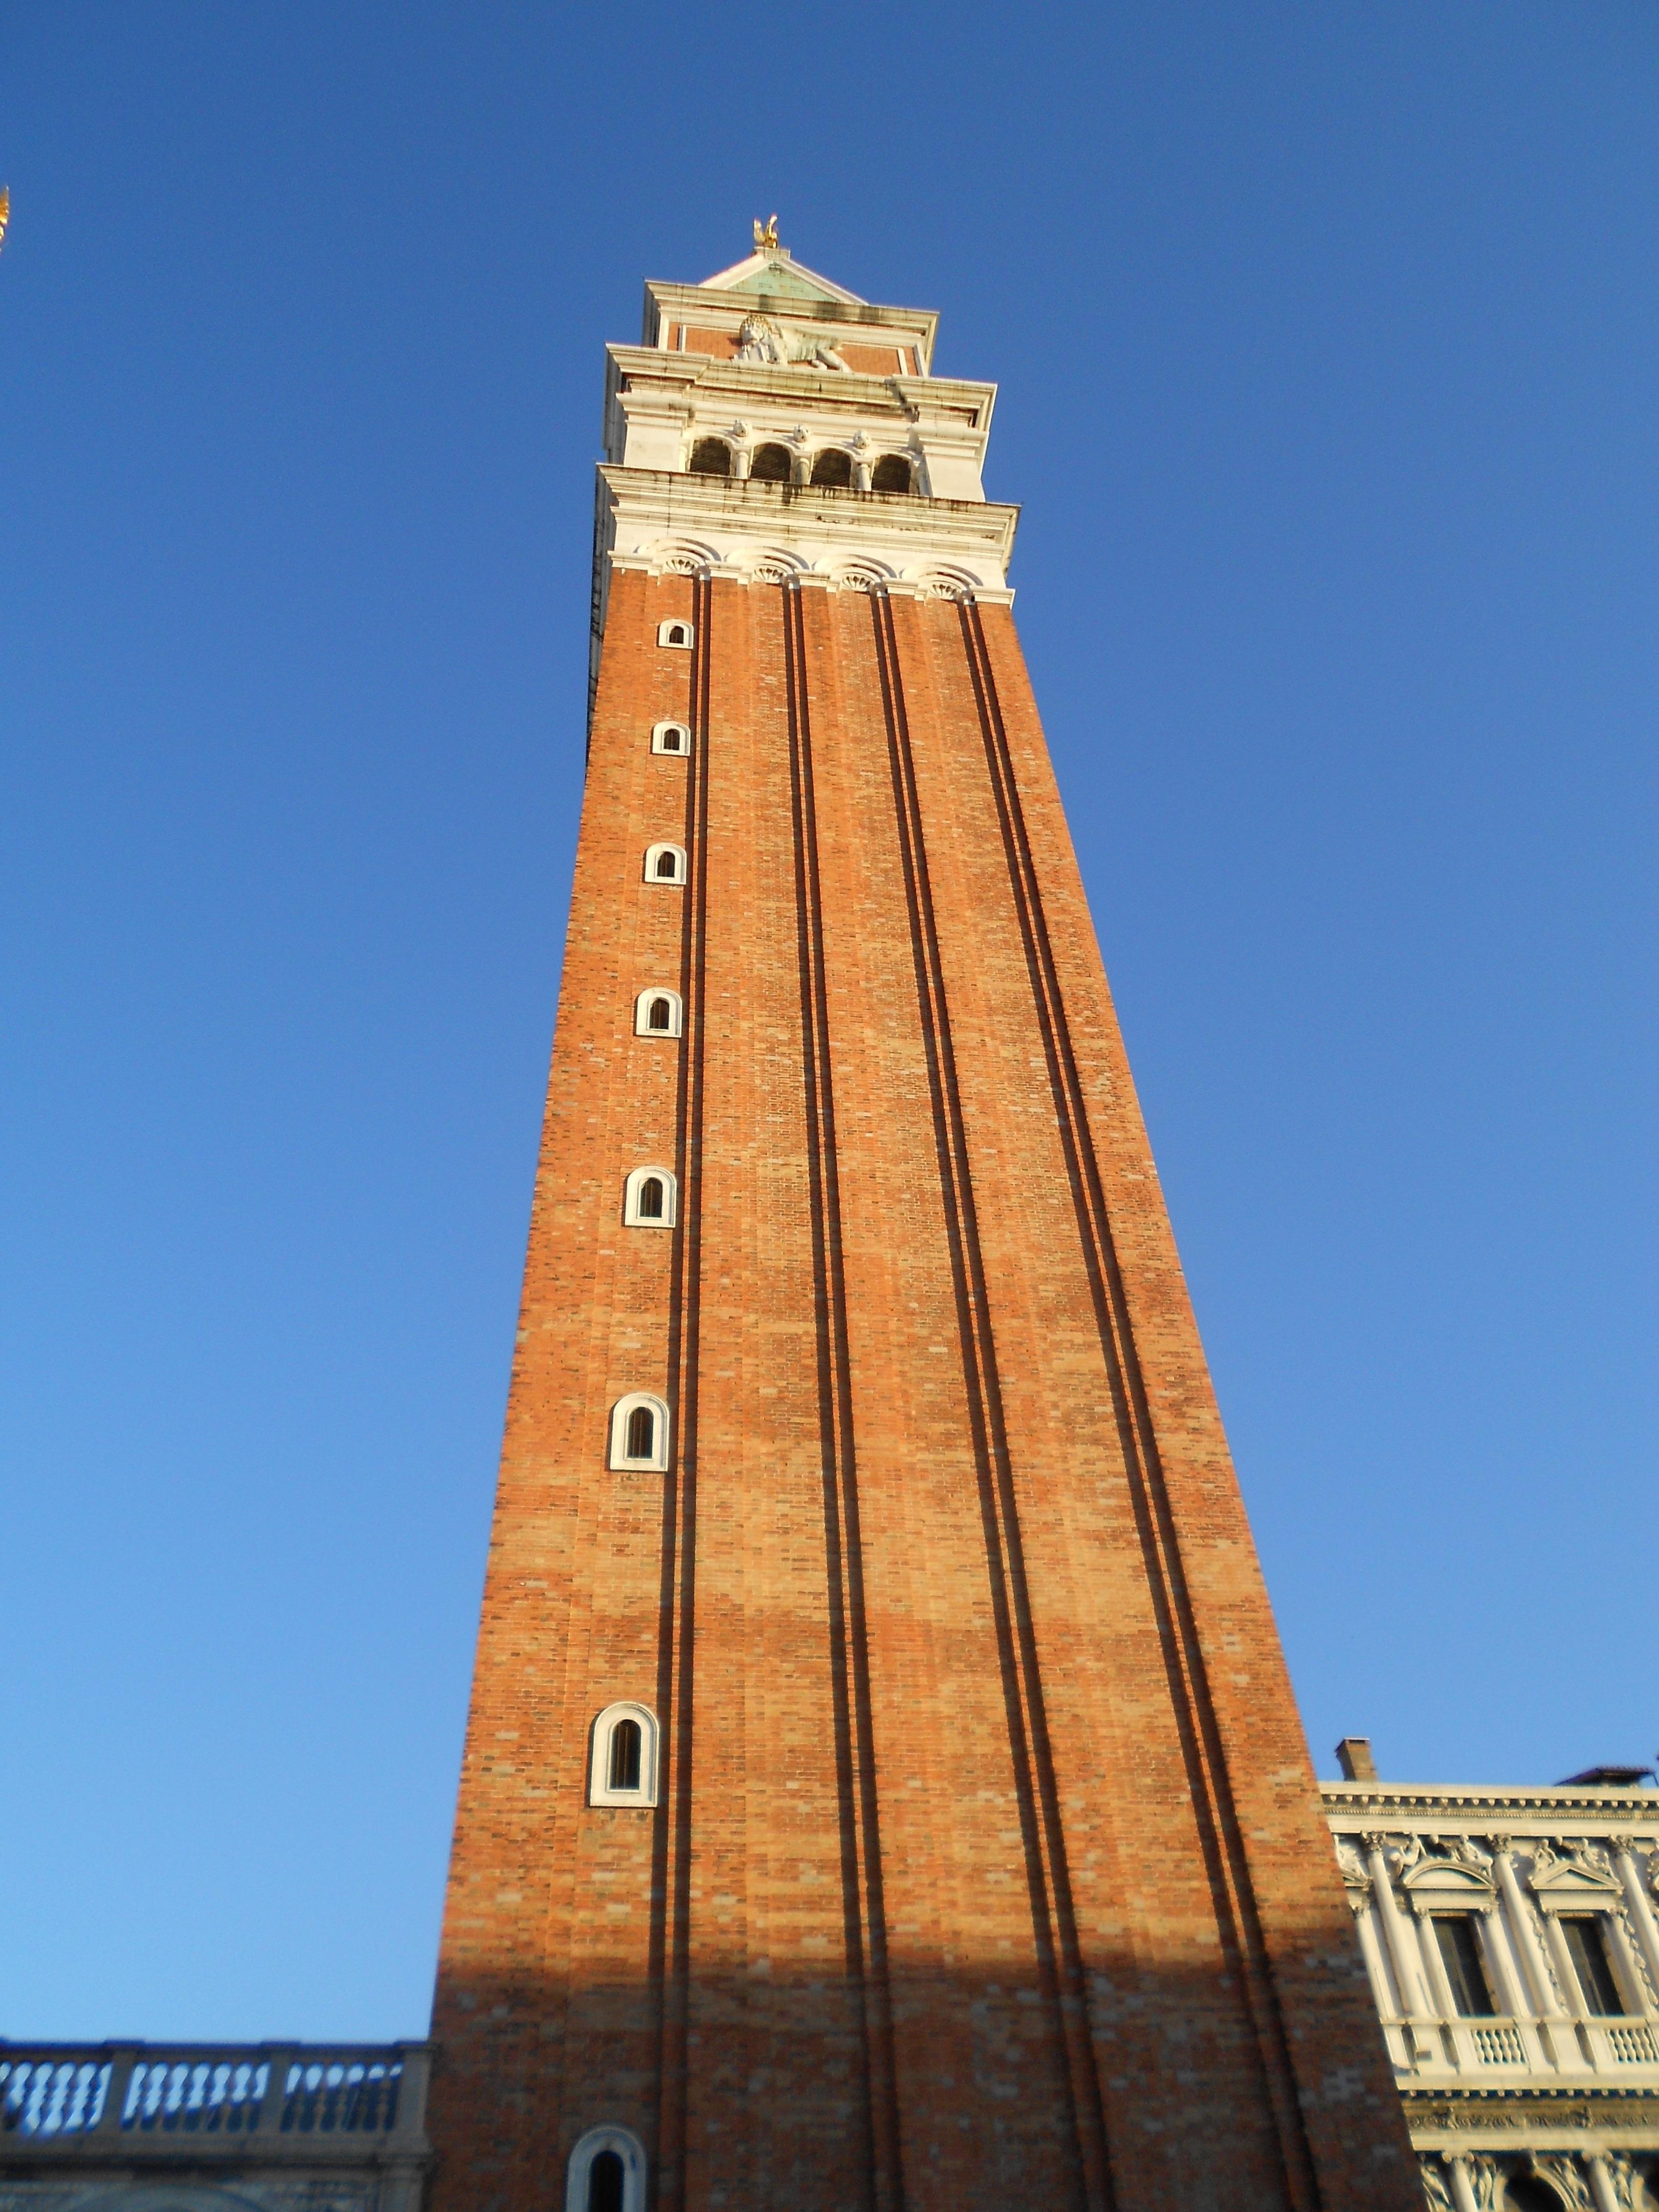 Fotos gratis : rascacielos, Monumento, torre, cuadrado, punto de ...